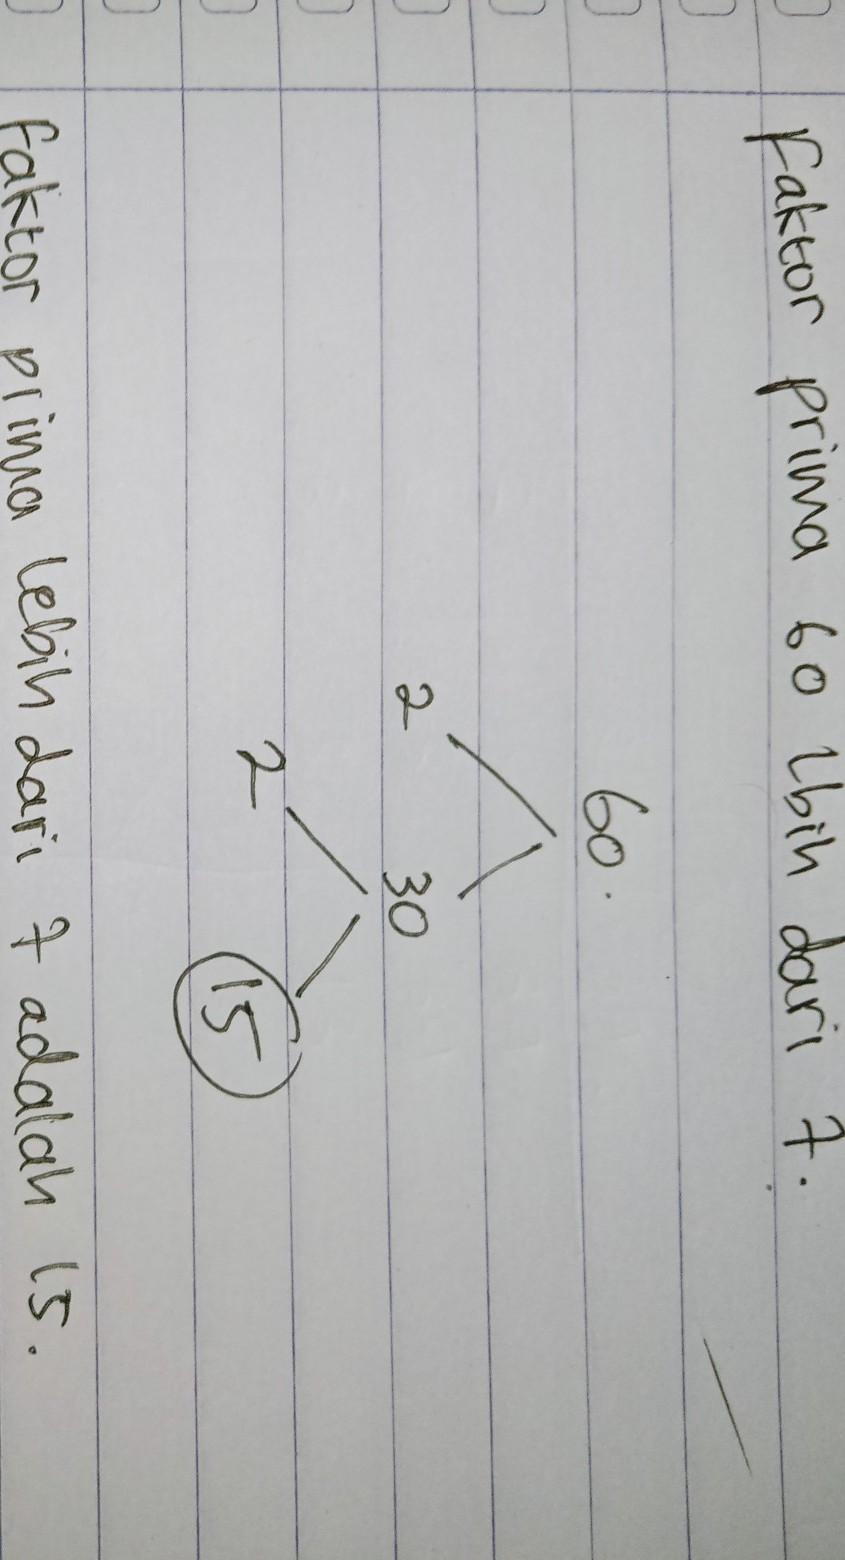 Faktorisasi Prima Dari 60 : faktorisasi, prima, Faktor, Prima, Lebih, Brainly.co.id